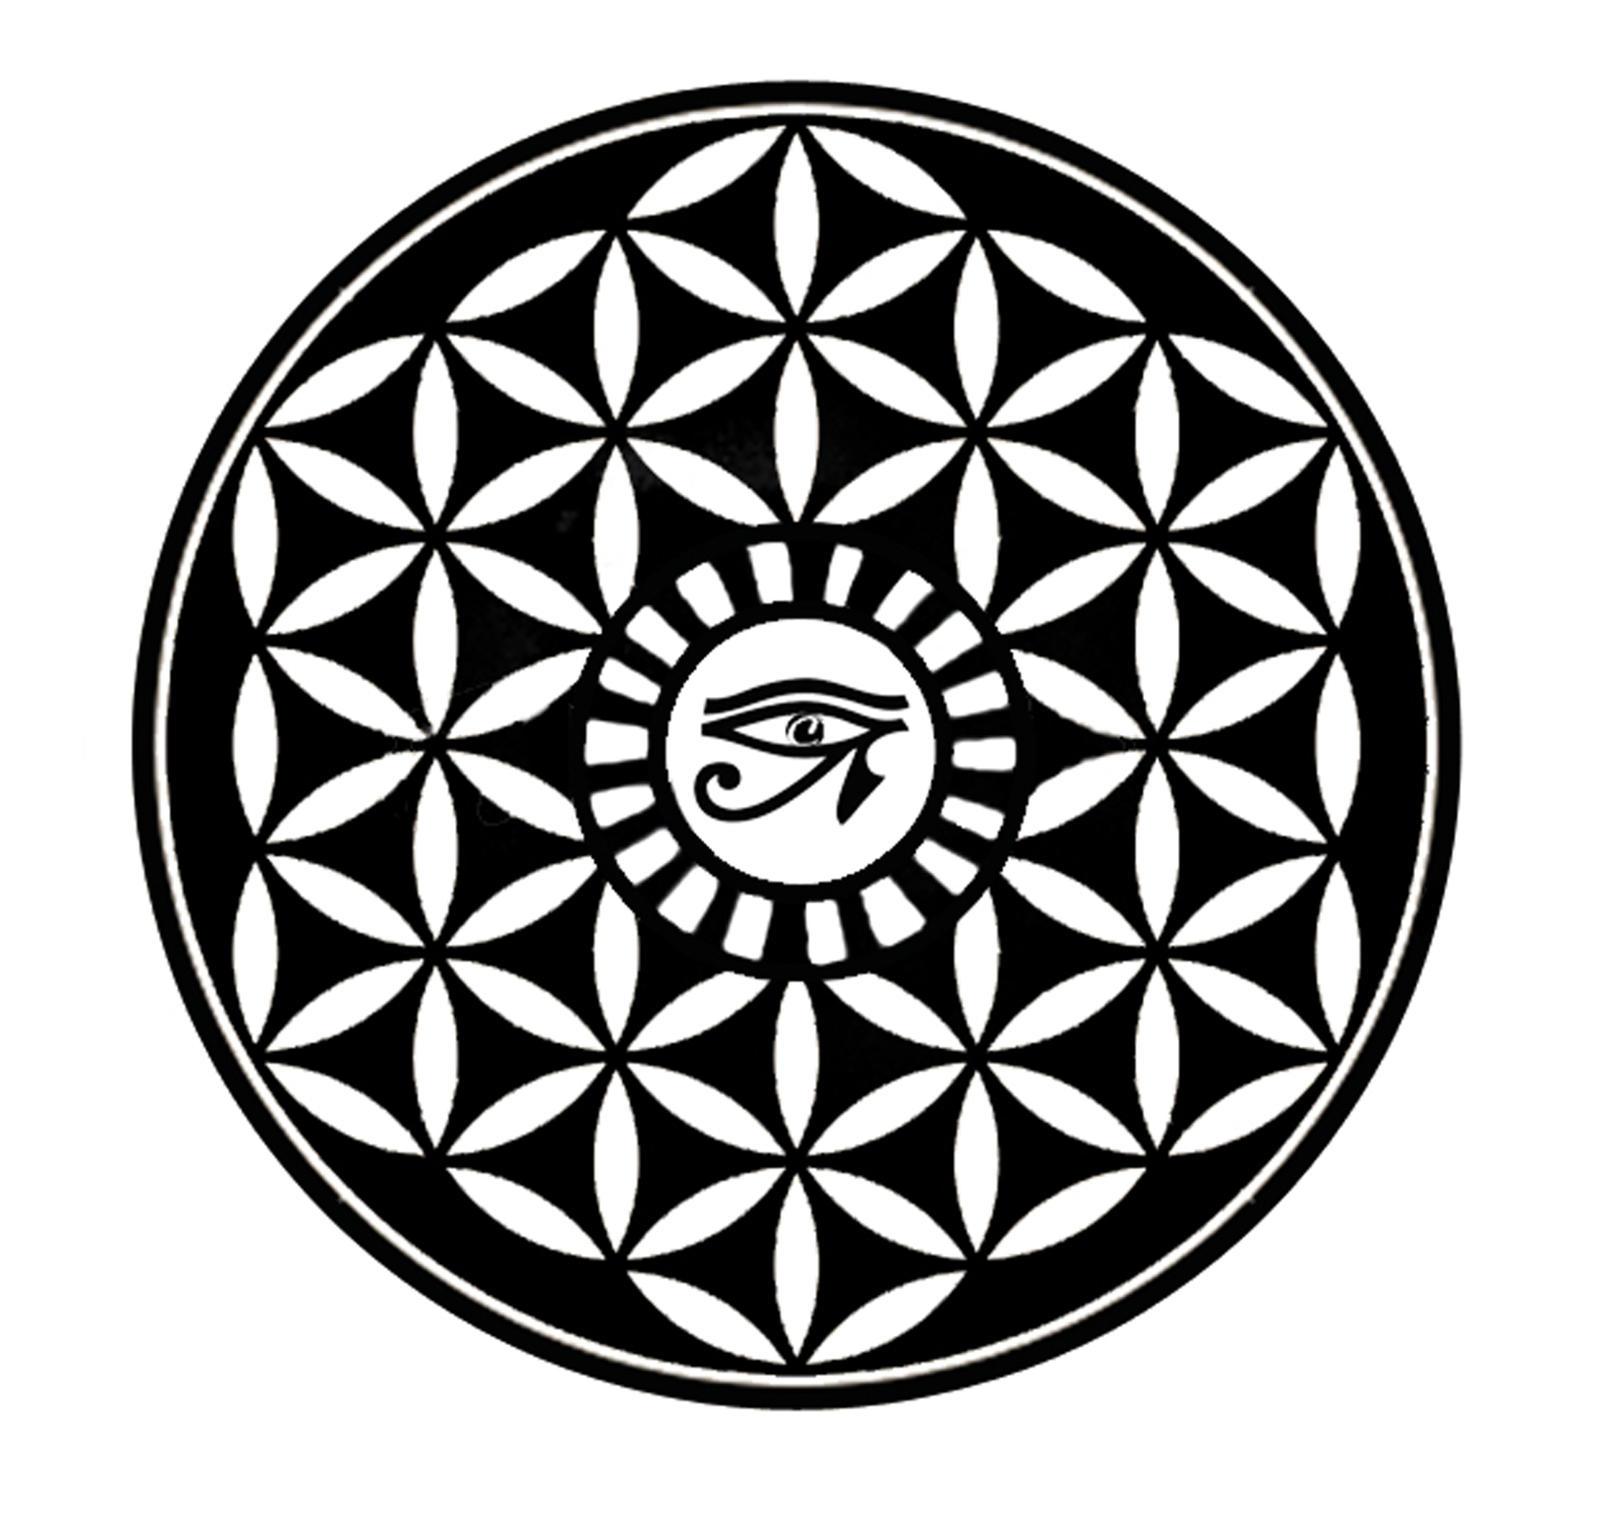 choka flower of life emblem 1 by dmvcustomdesign on deviantart. Black Bedroom Furniture Sets. Home Design Ideas